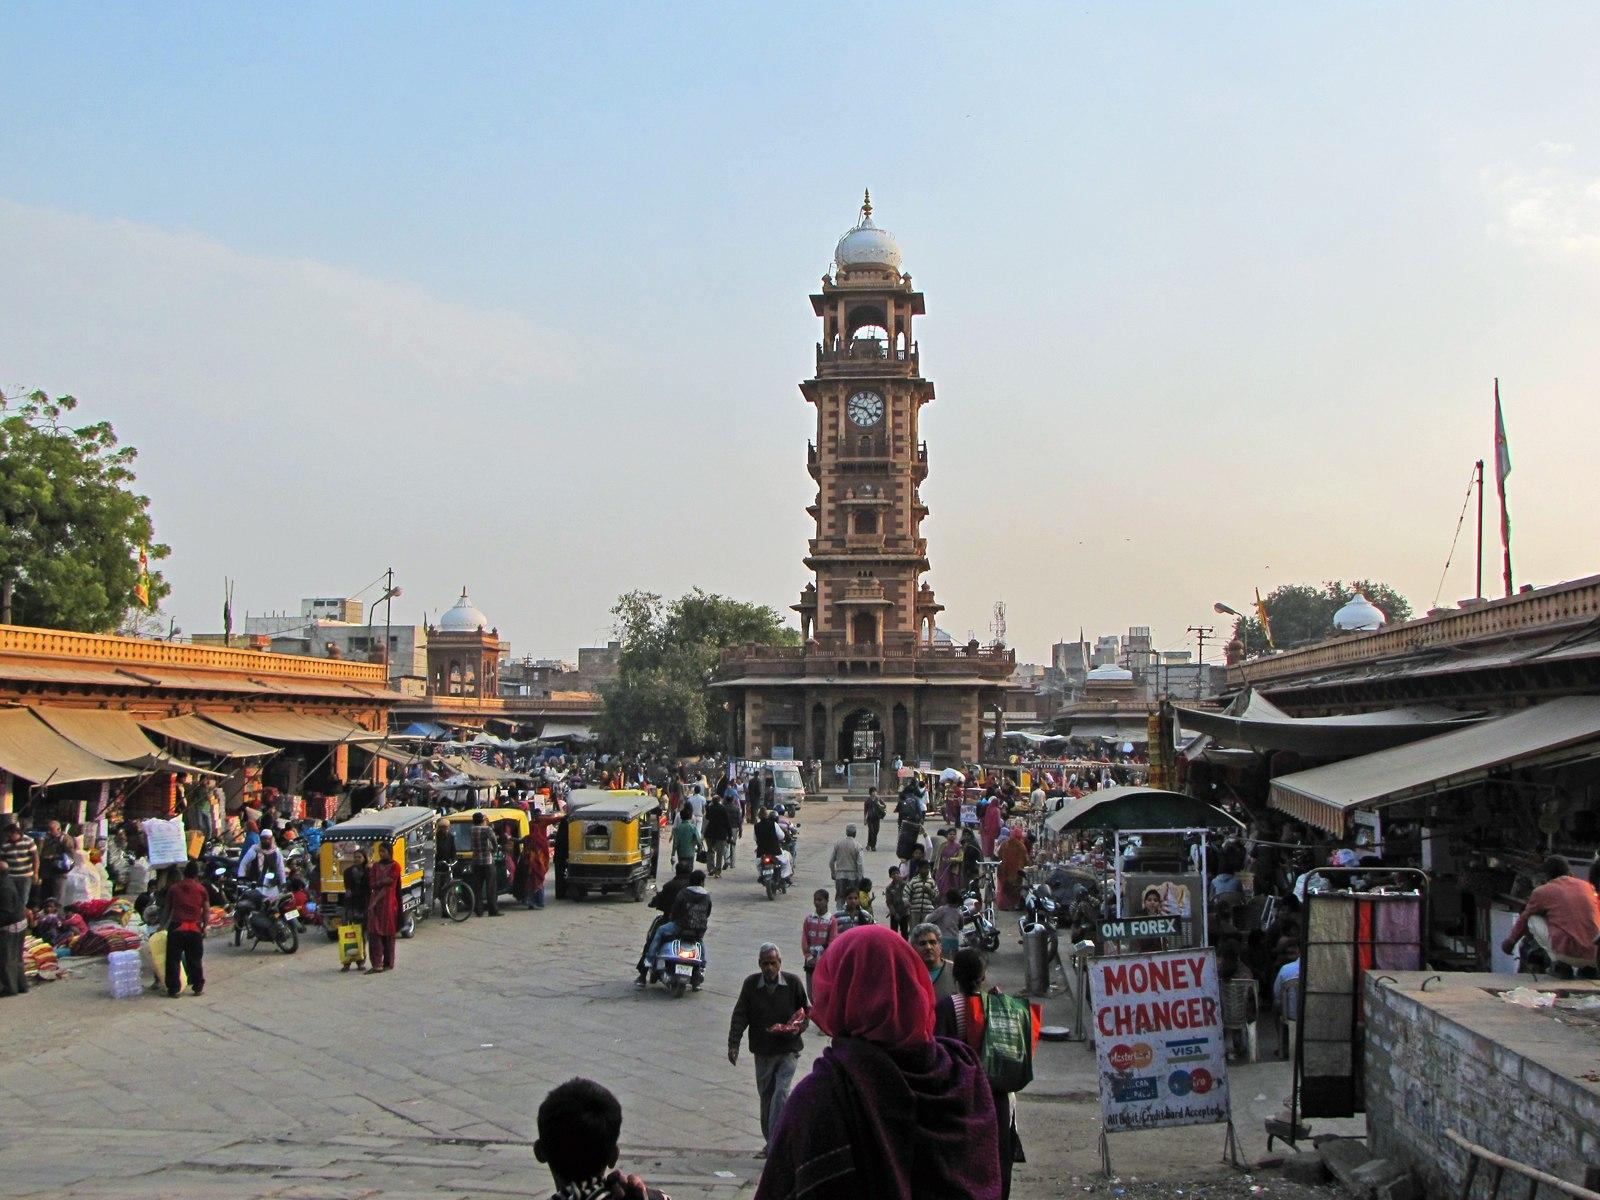 La torre dell'orologio, Jodhpur